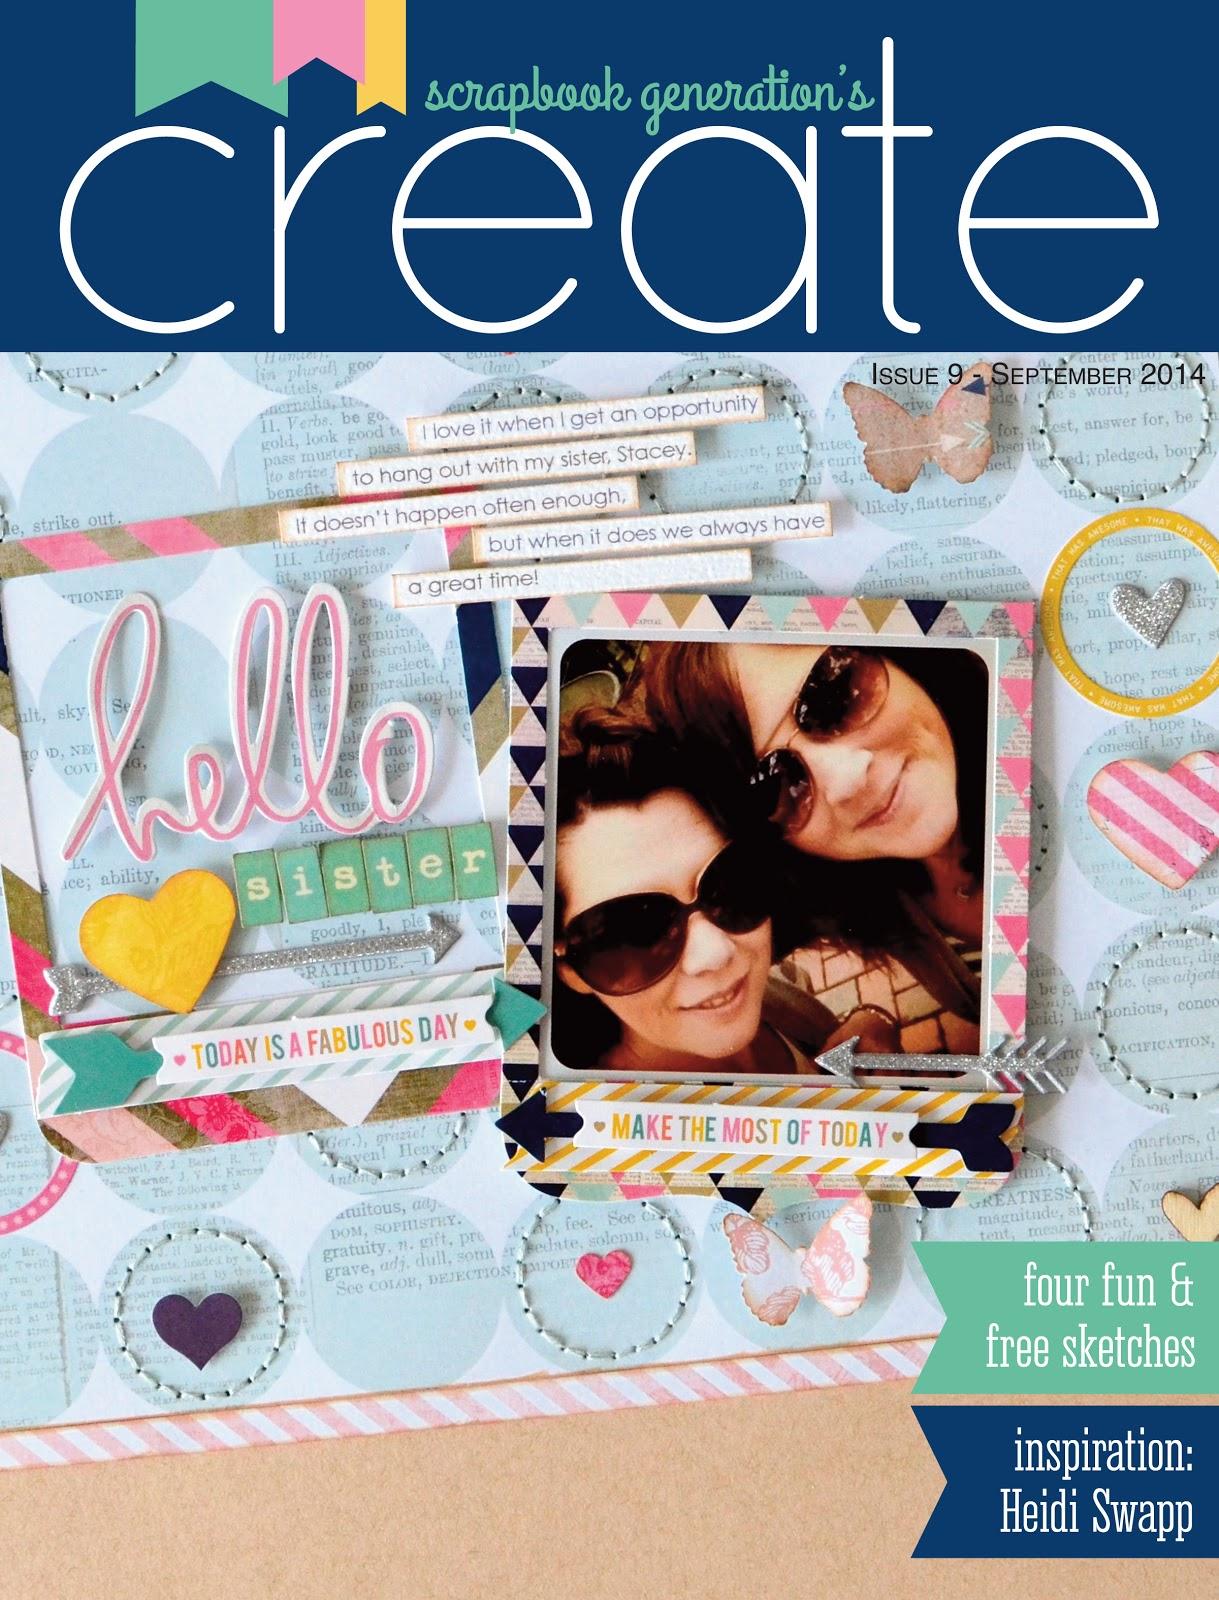 Scrapbook Generations Create FREE Digital Magazine Issue 9 Featuring Heidi Swapp @heidiswapp @createbysg #heidiswapp #hsSeptemberSkies #scrapbookgenerations